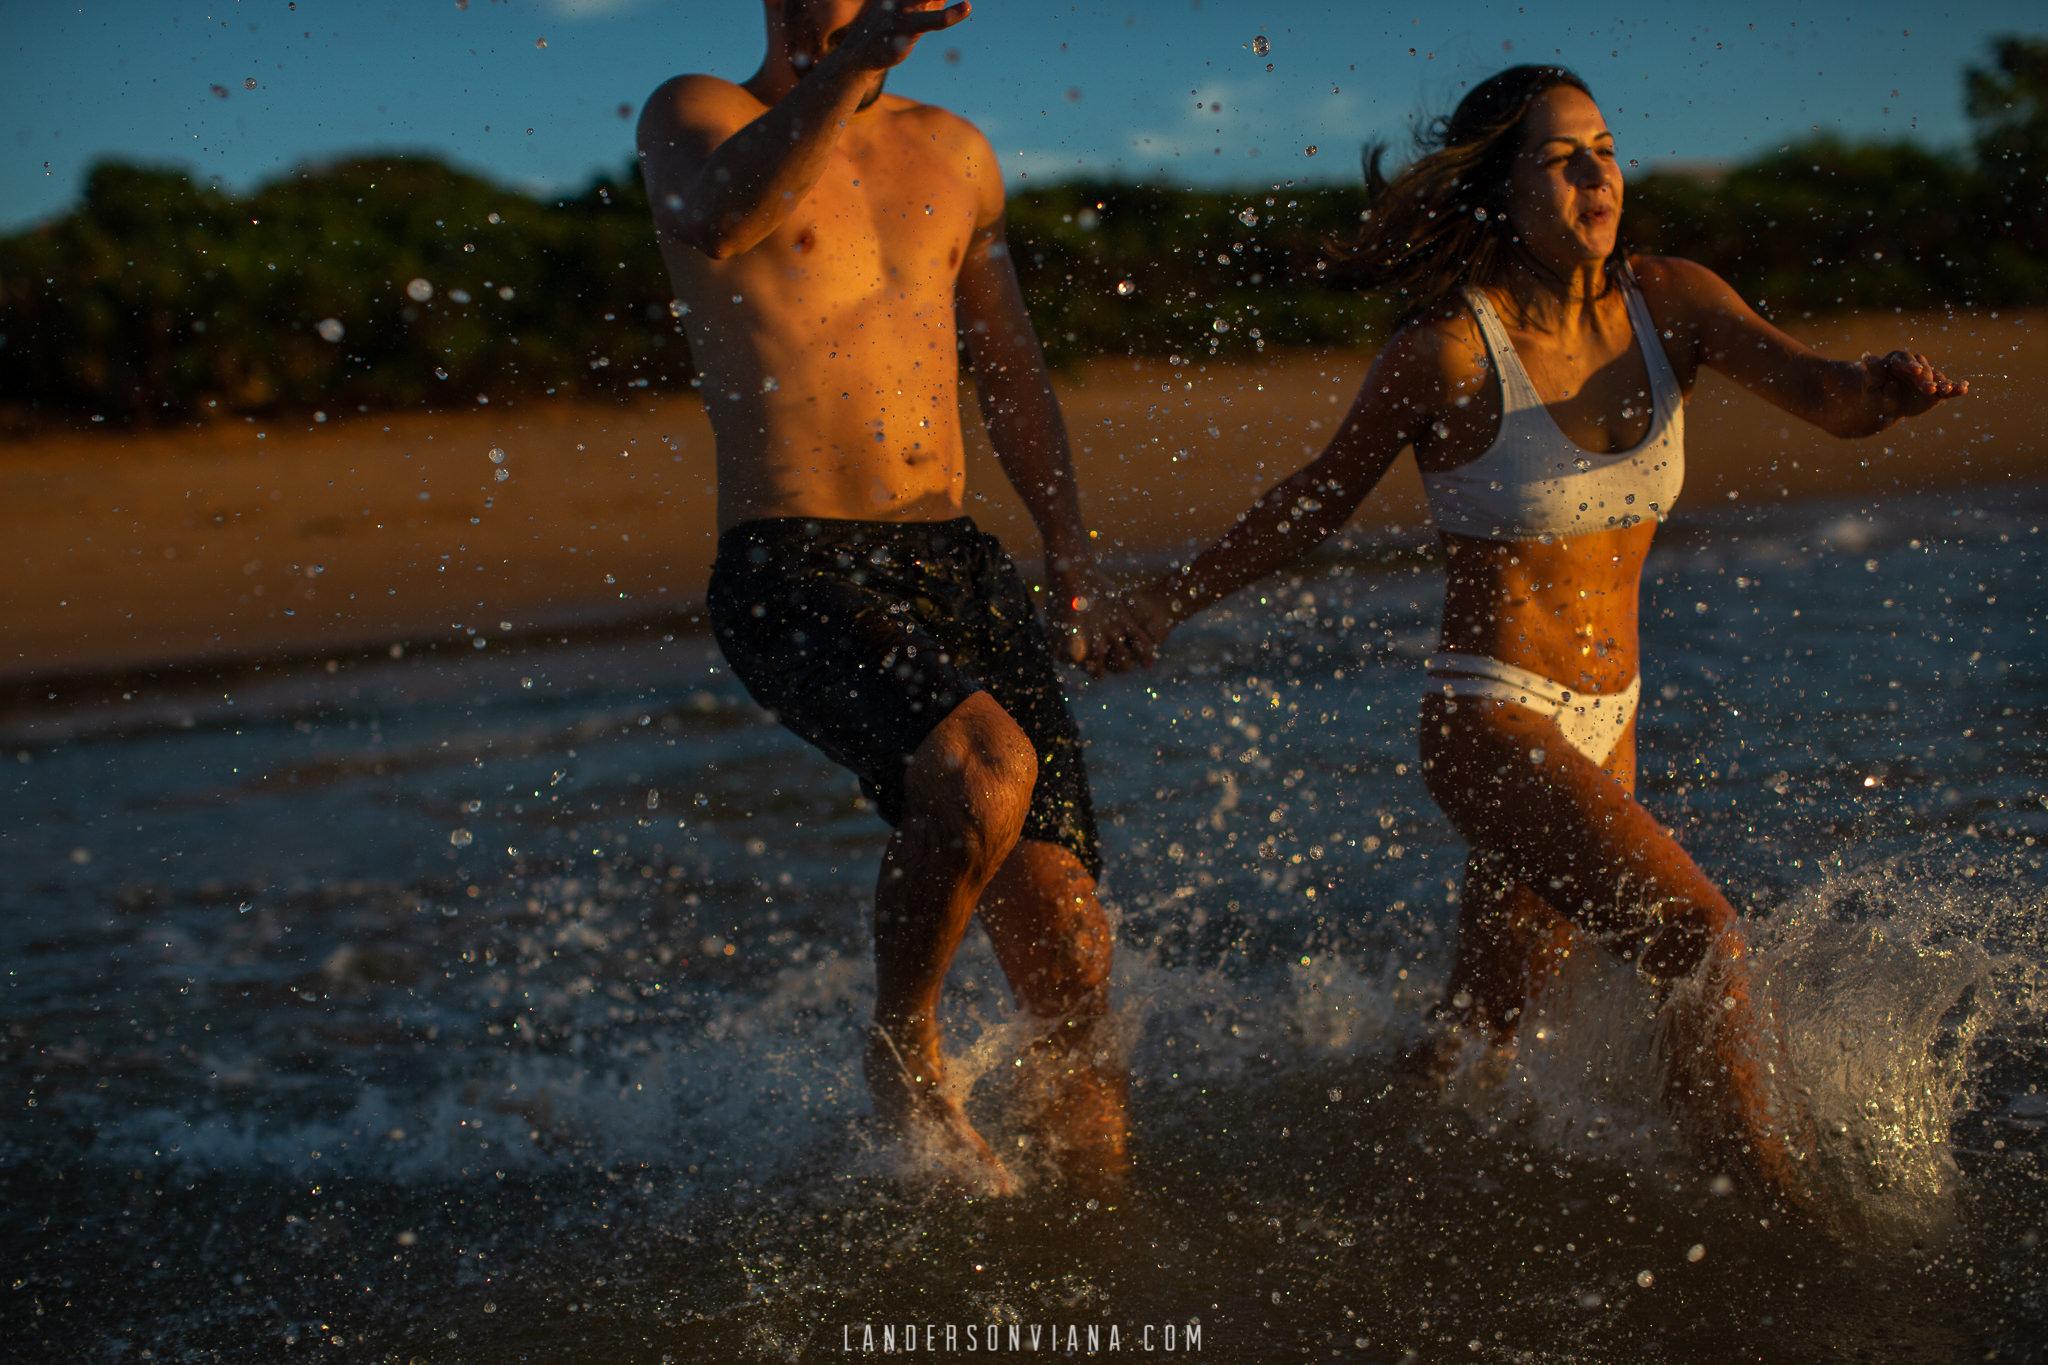 ensaio-pre-wedding-praia-landerson-viana-fotografia-casamento-pegueiobouquet-71.jpg